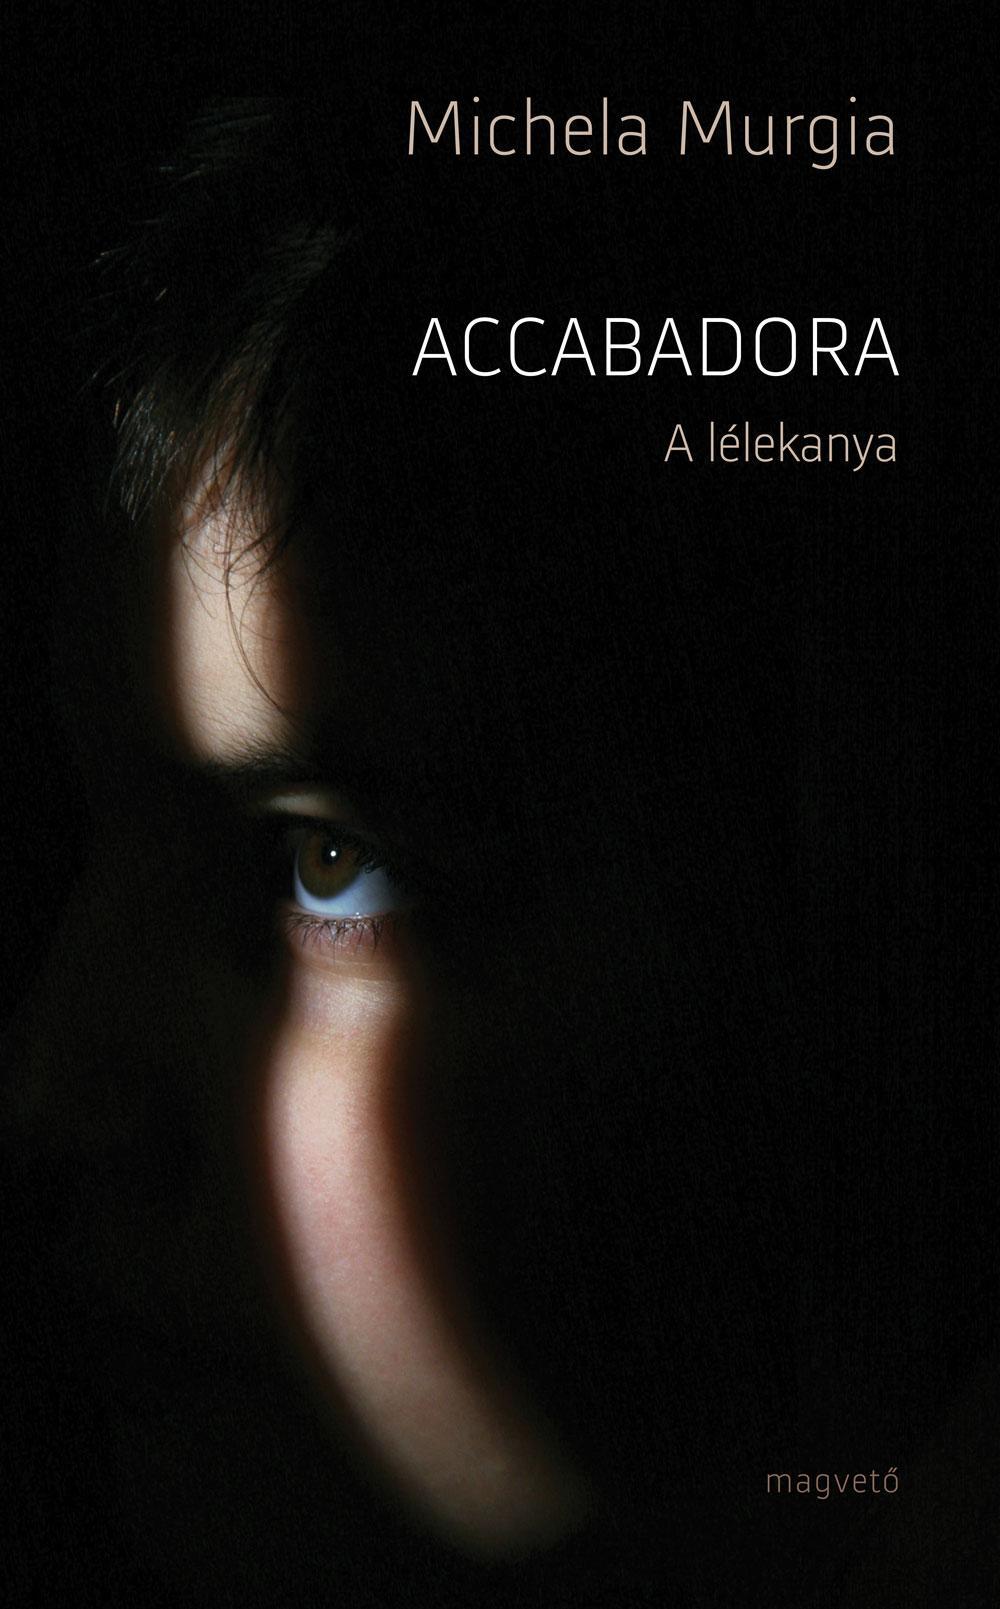 Michaela Murgia - Accabadora - A lélekanya